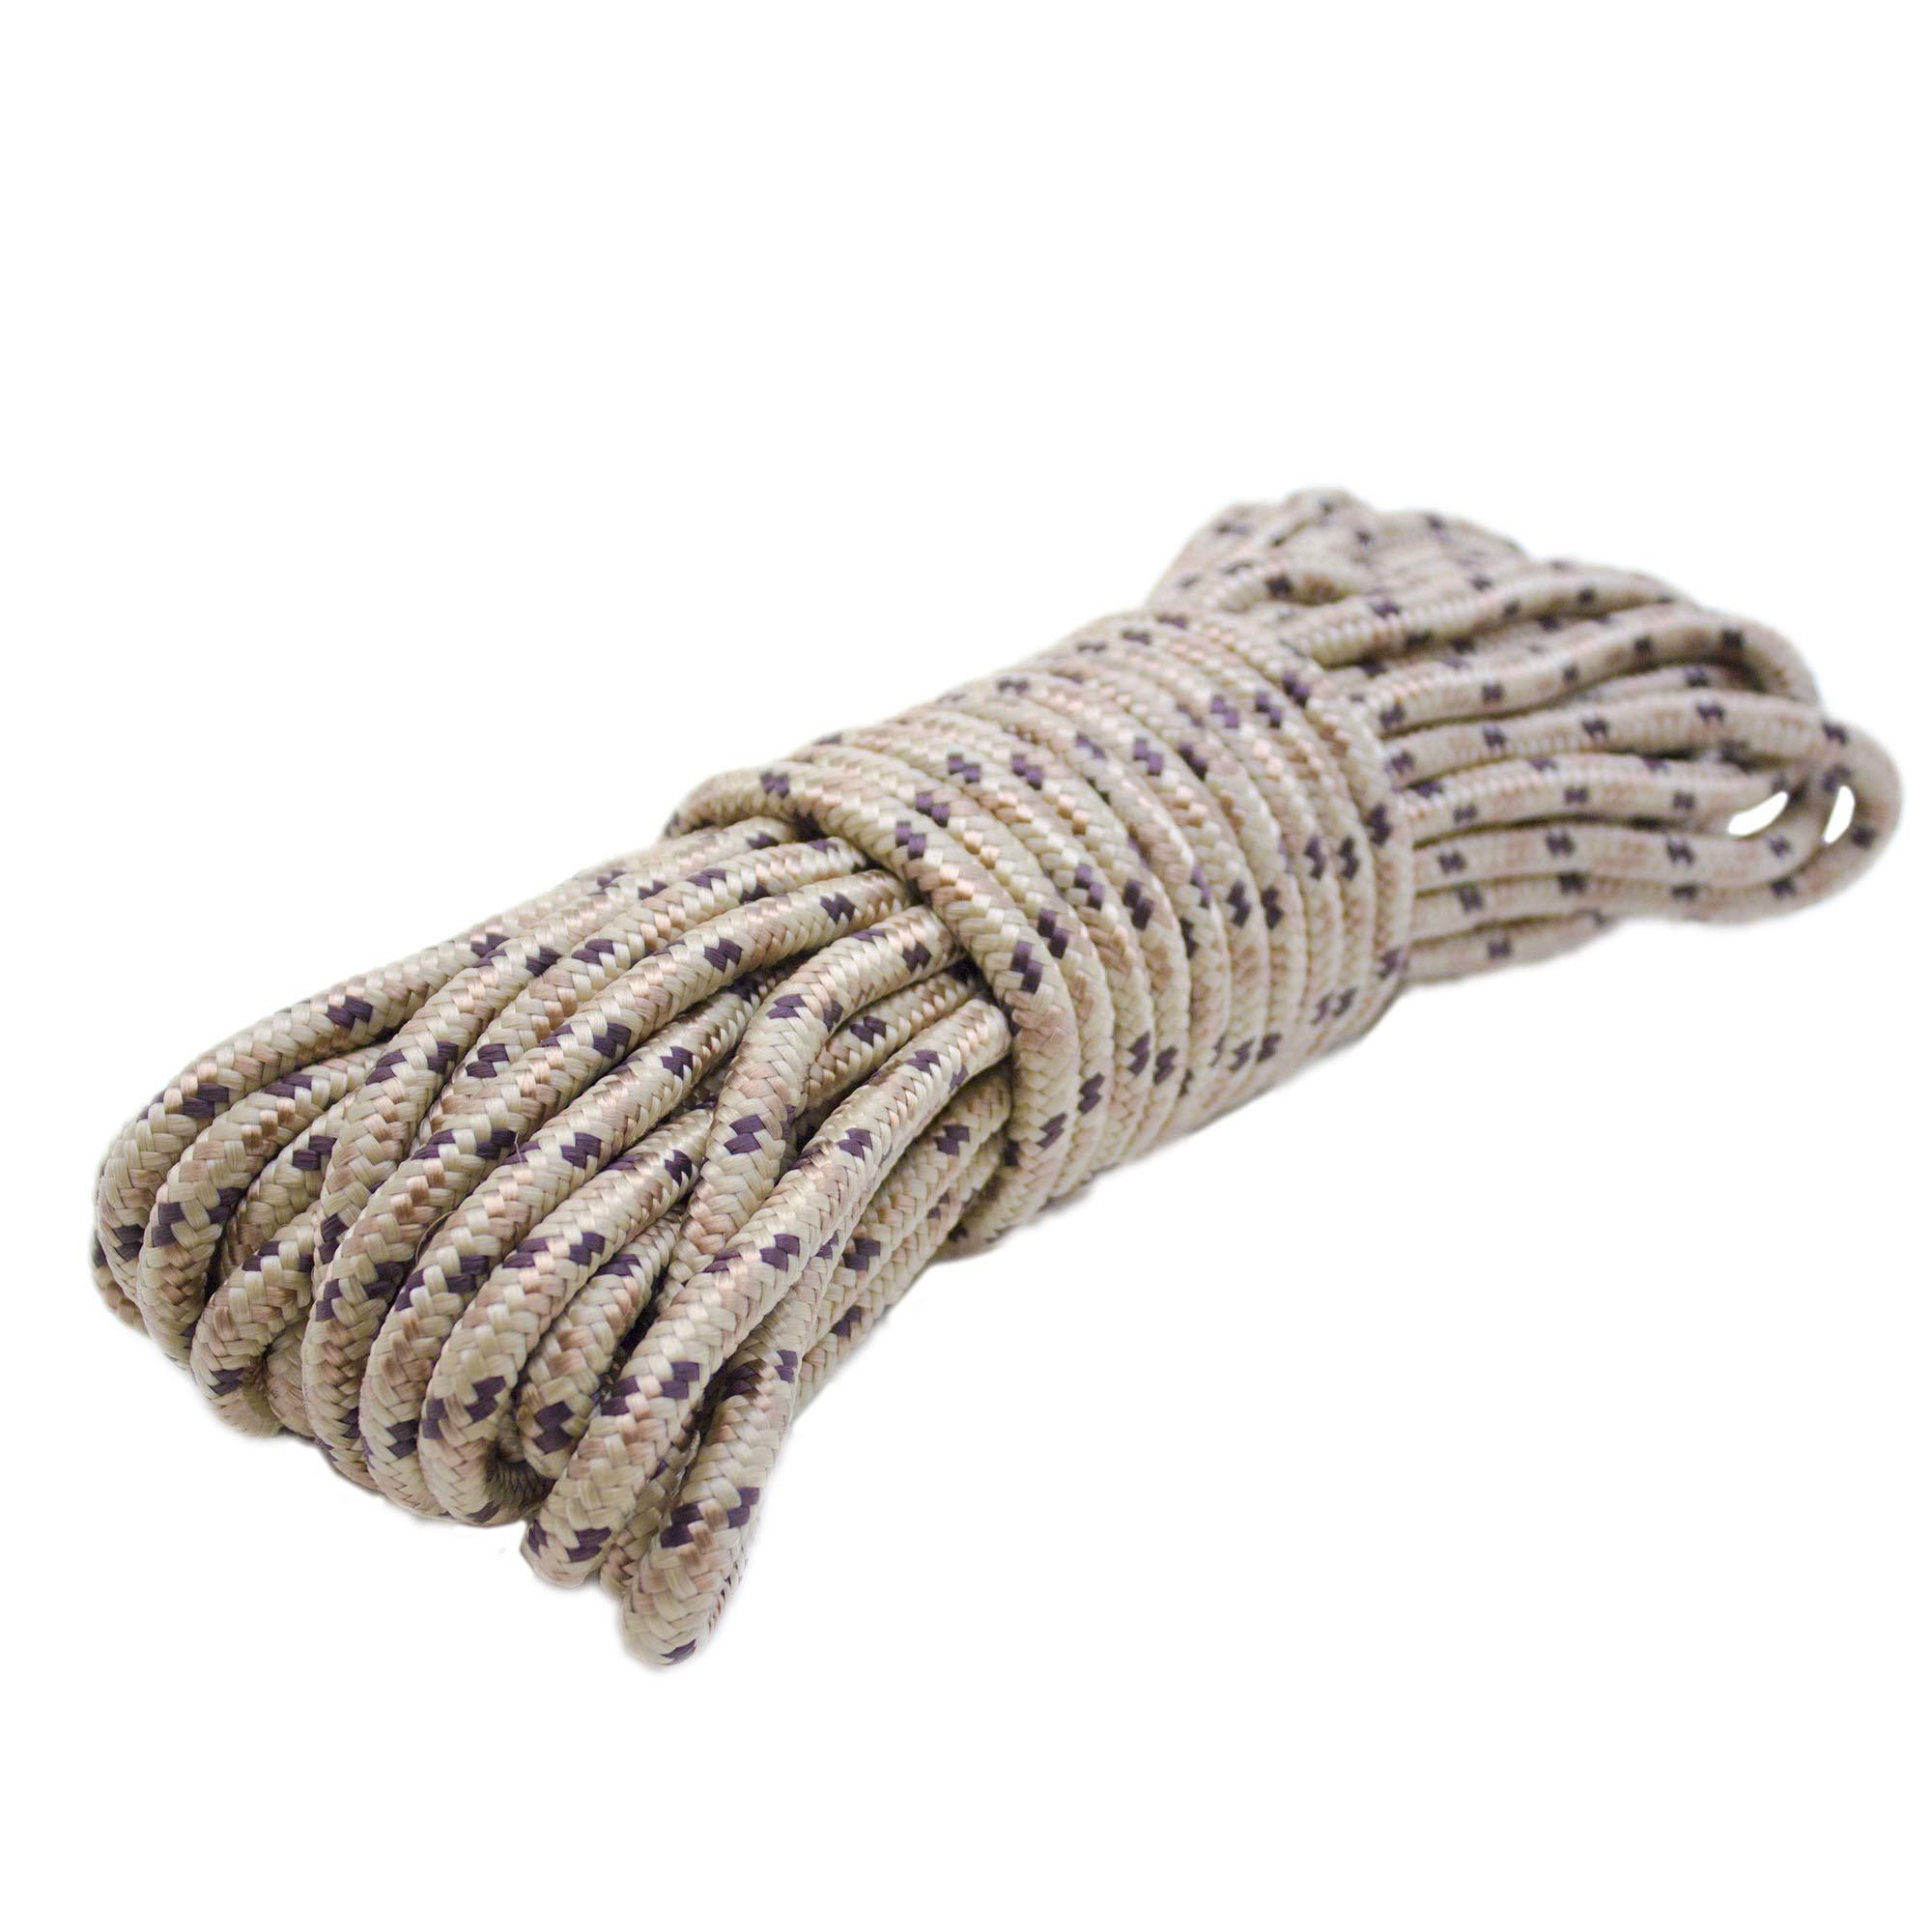 Emergency Zone 9mm (3/8 inch) Nylon Braided, 50 Foot, Multi-Purpose Rope. Camouflage 1 Pack